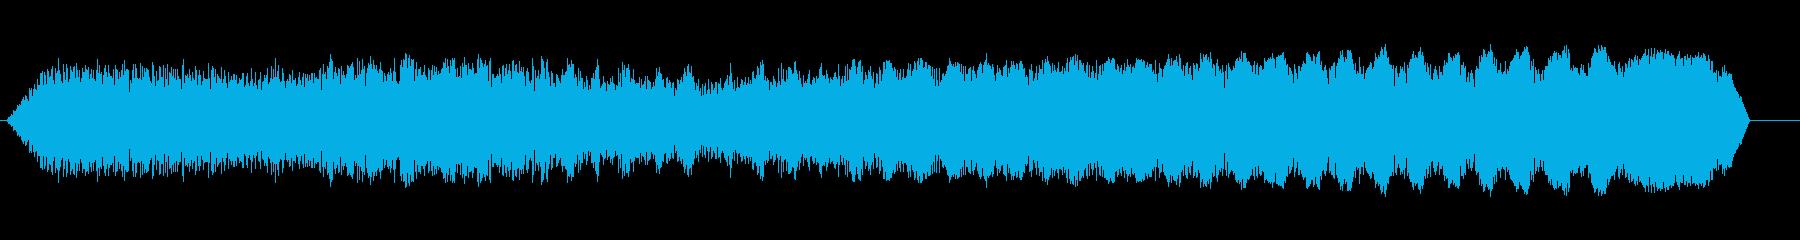 GTSカー; Idle / Rev...の再生済みの波形